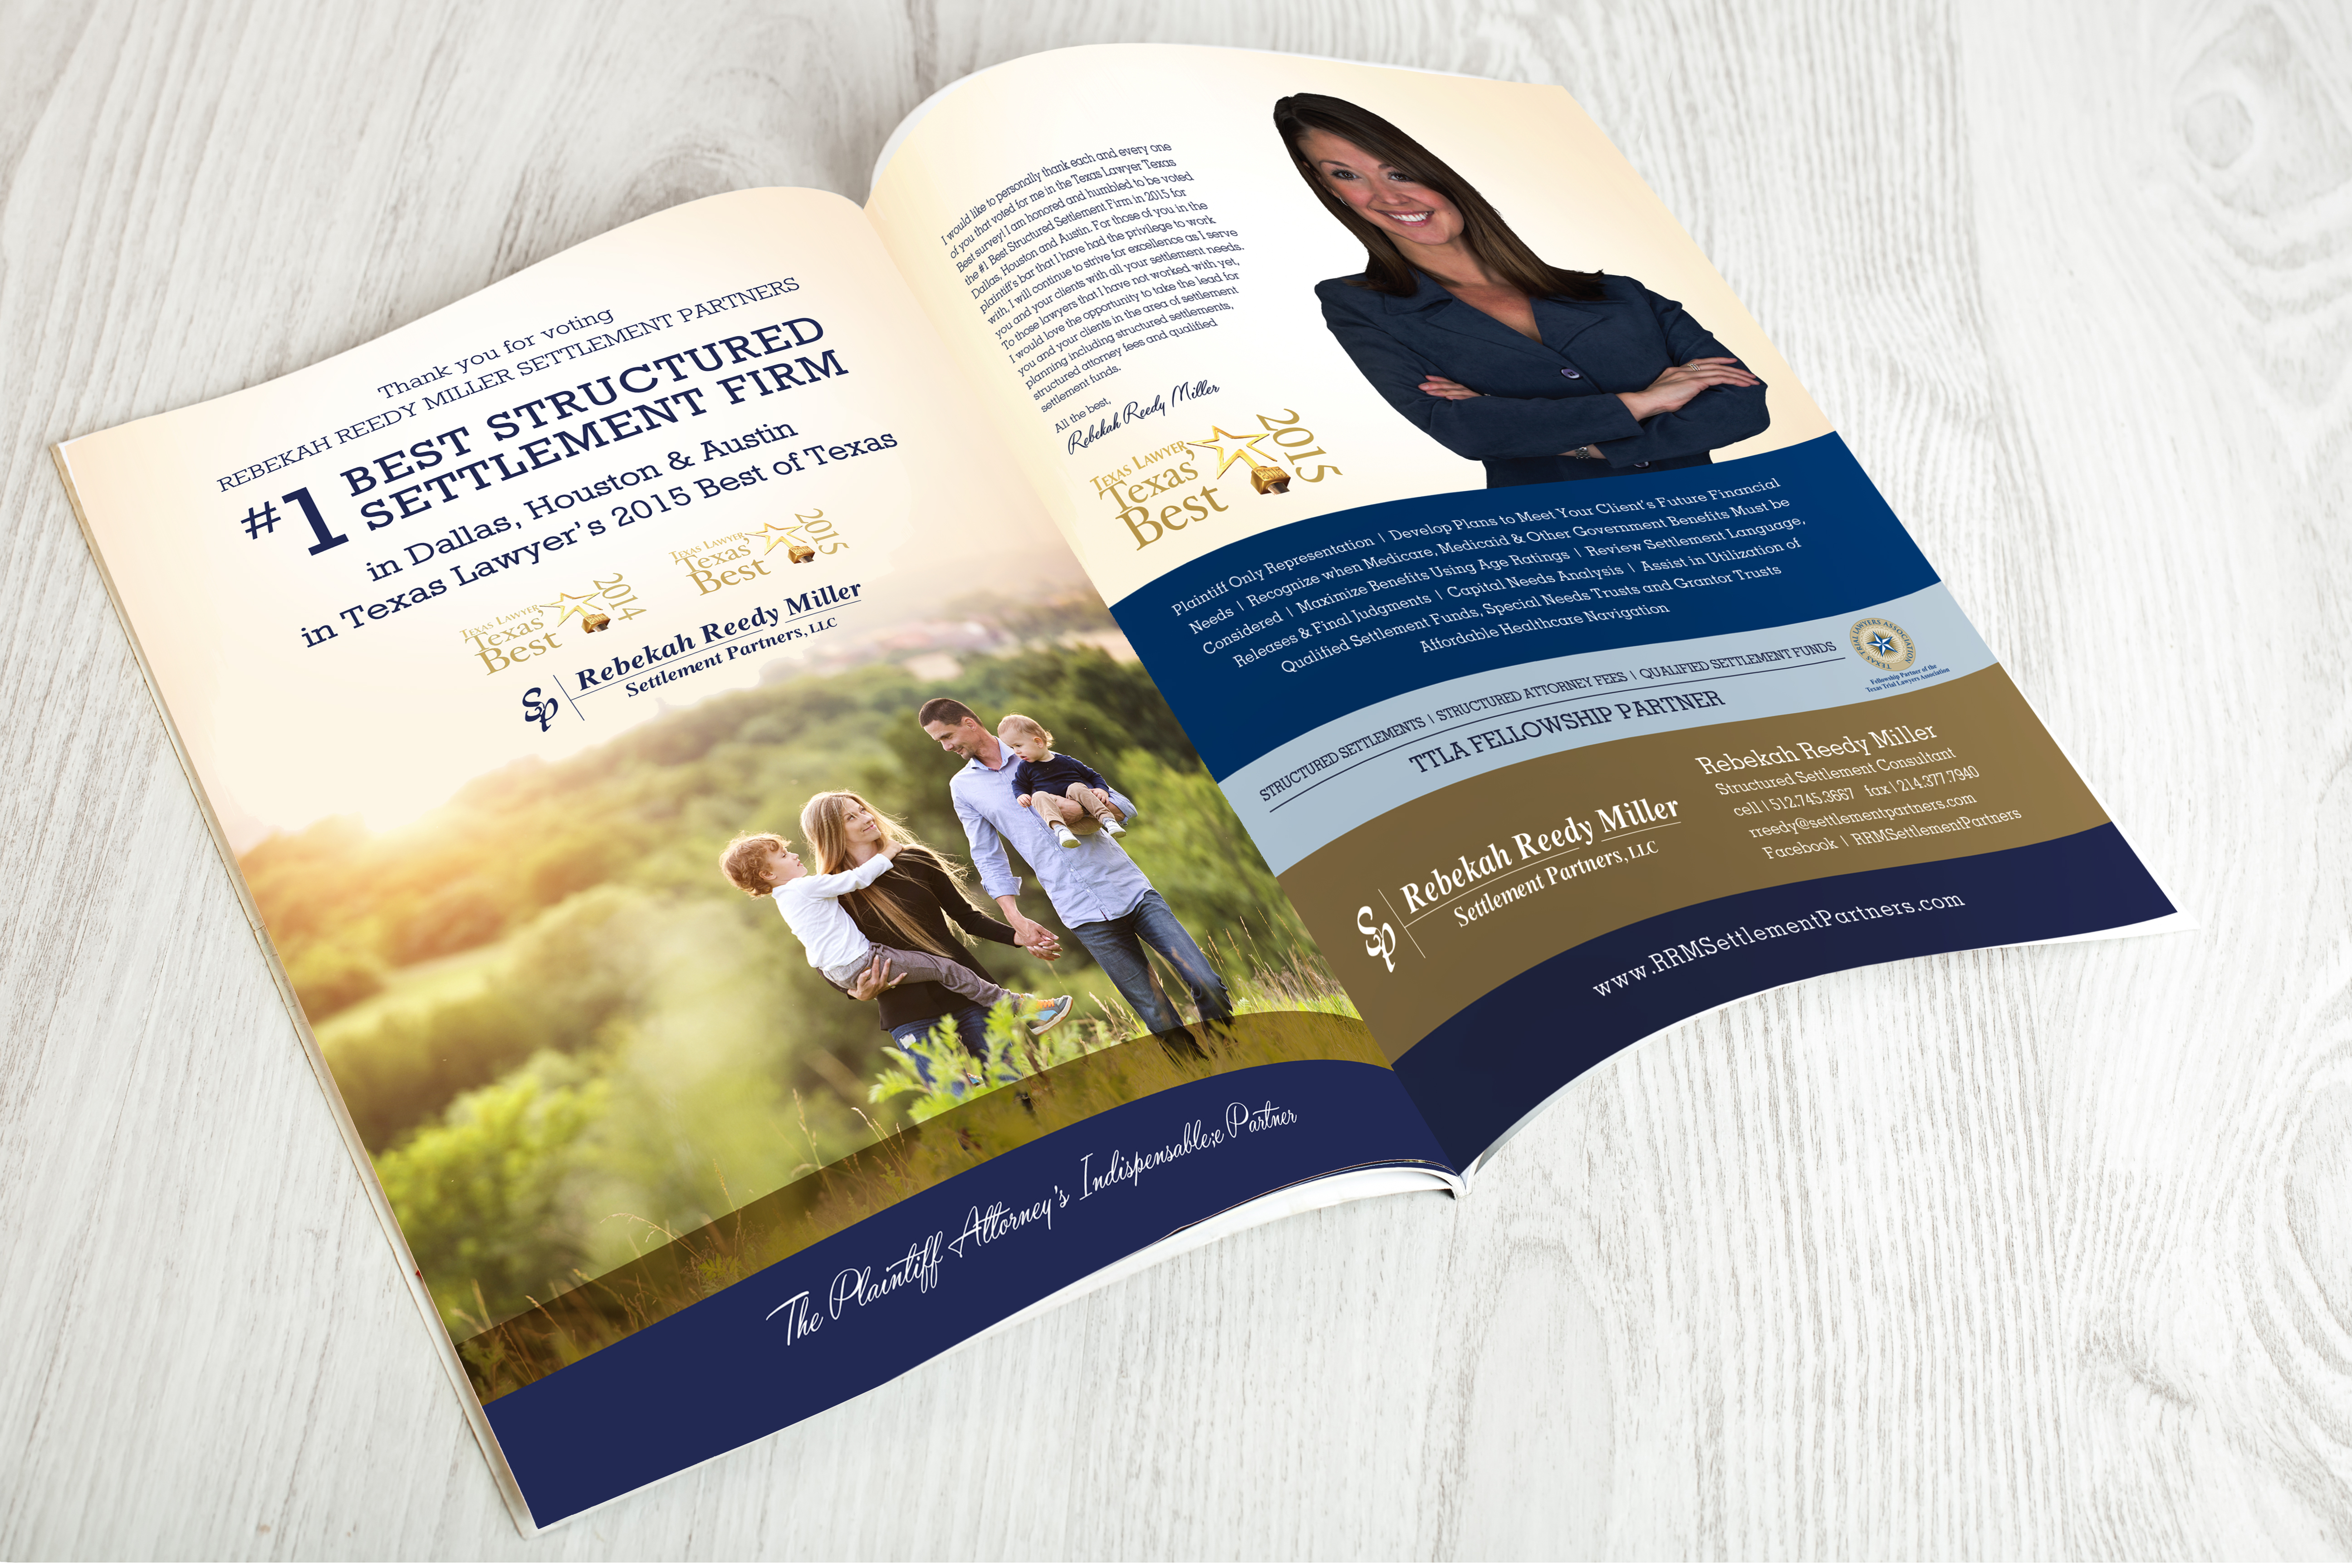 Rebekah Reedy Miller Settlements Ad